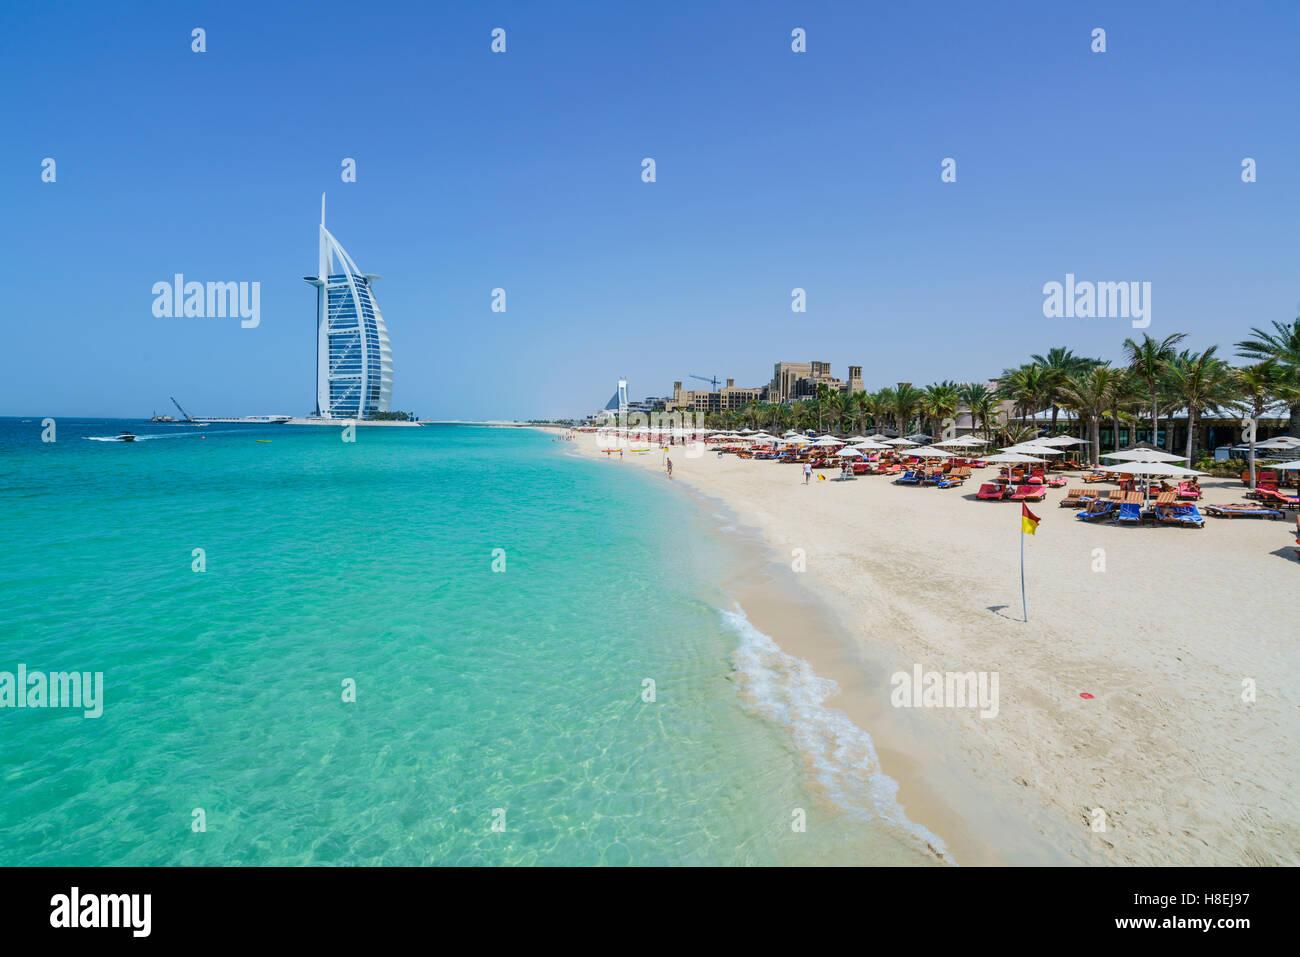 Il Burj Al Arab Jumeirah Beach, Dubai, Emirati Arabi Uniti, Medio Oriente Immagini Stock